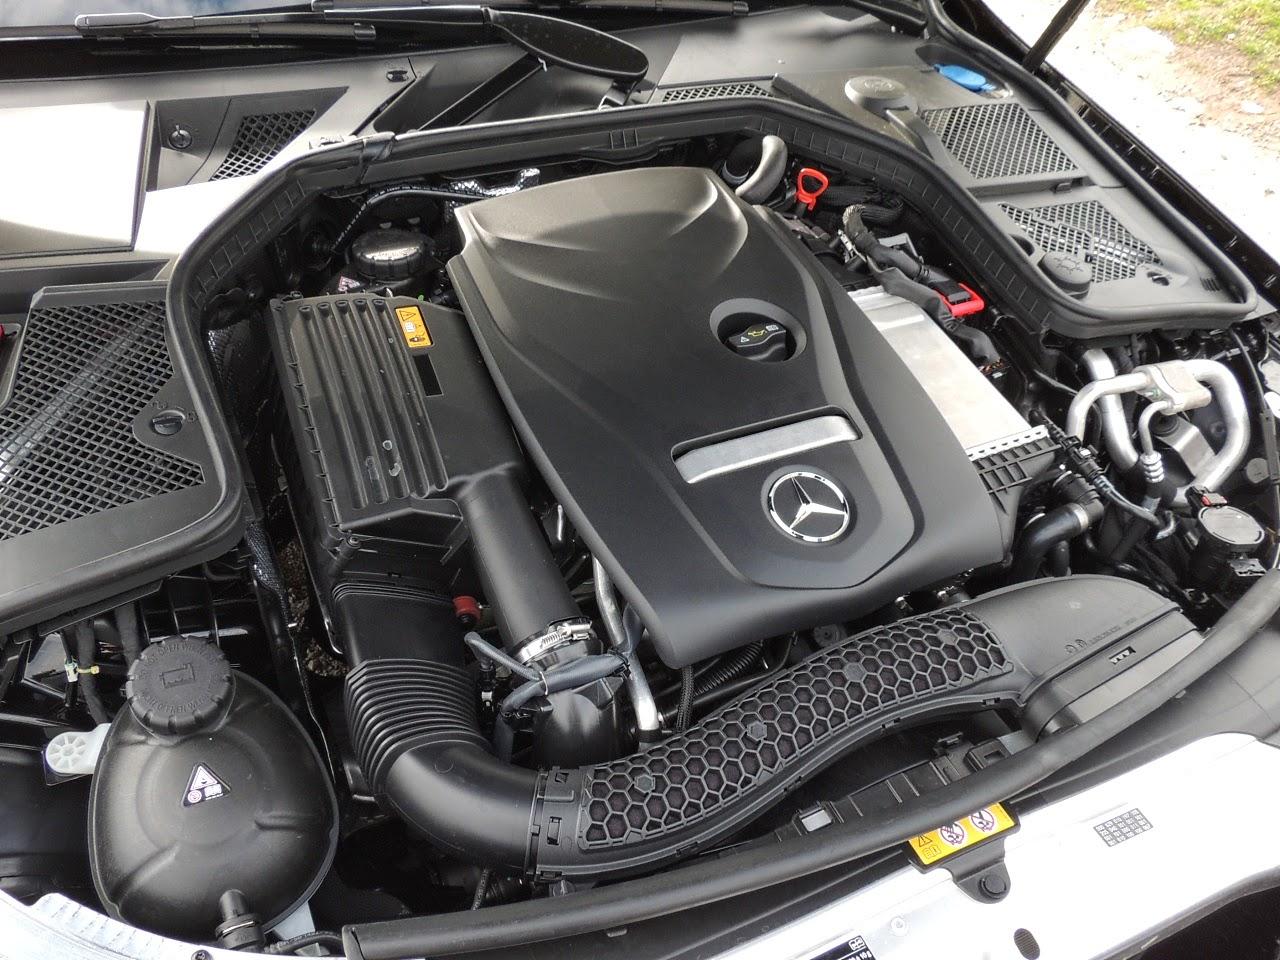 Mercedes Klasy C - silnik wersji 180 (1.6 turbo)